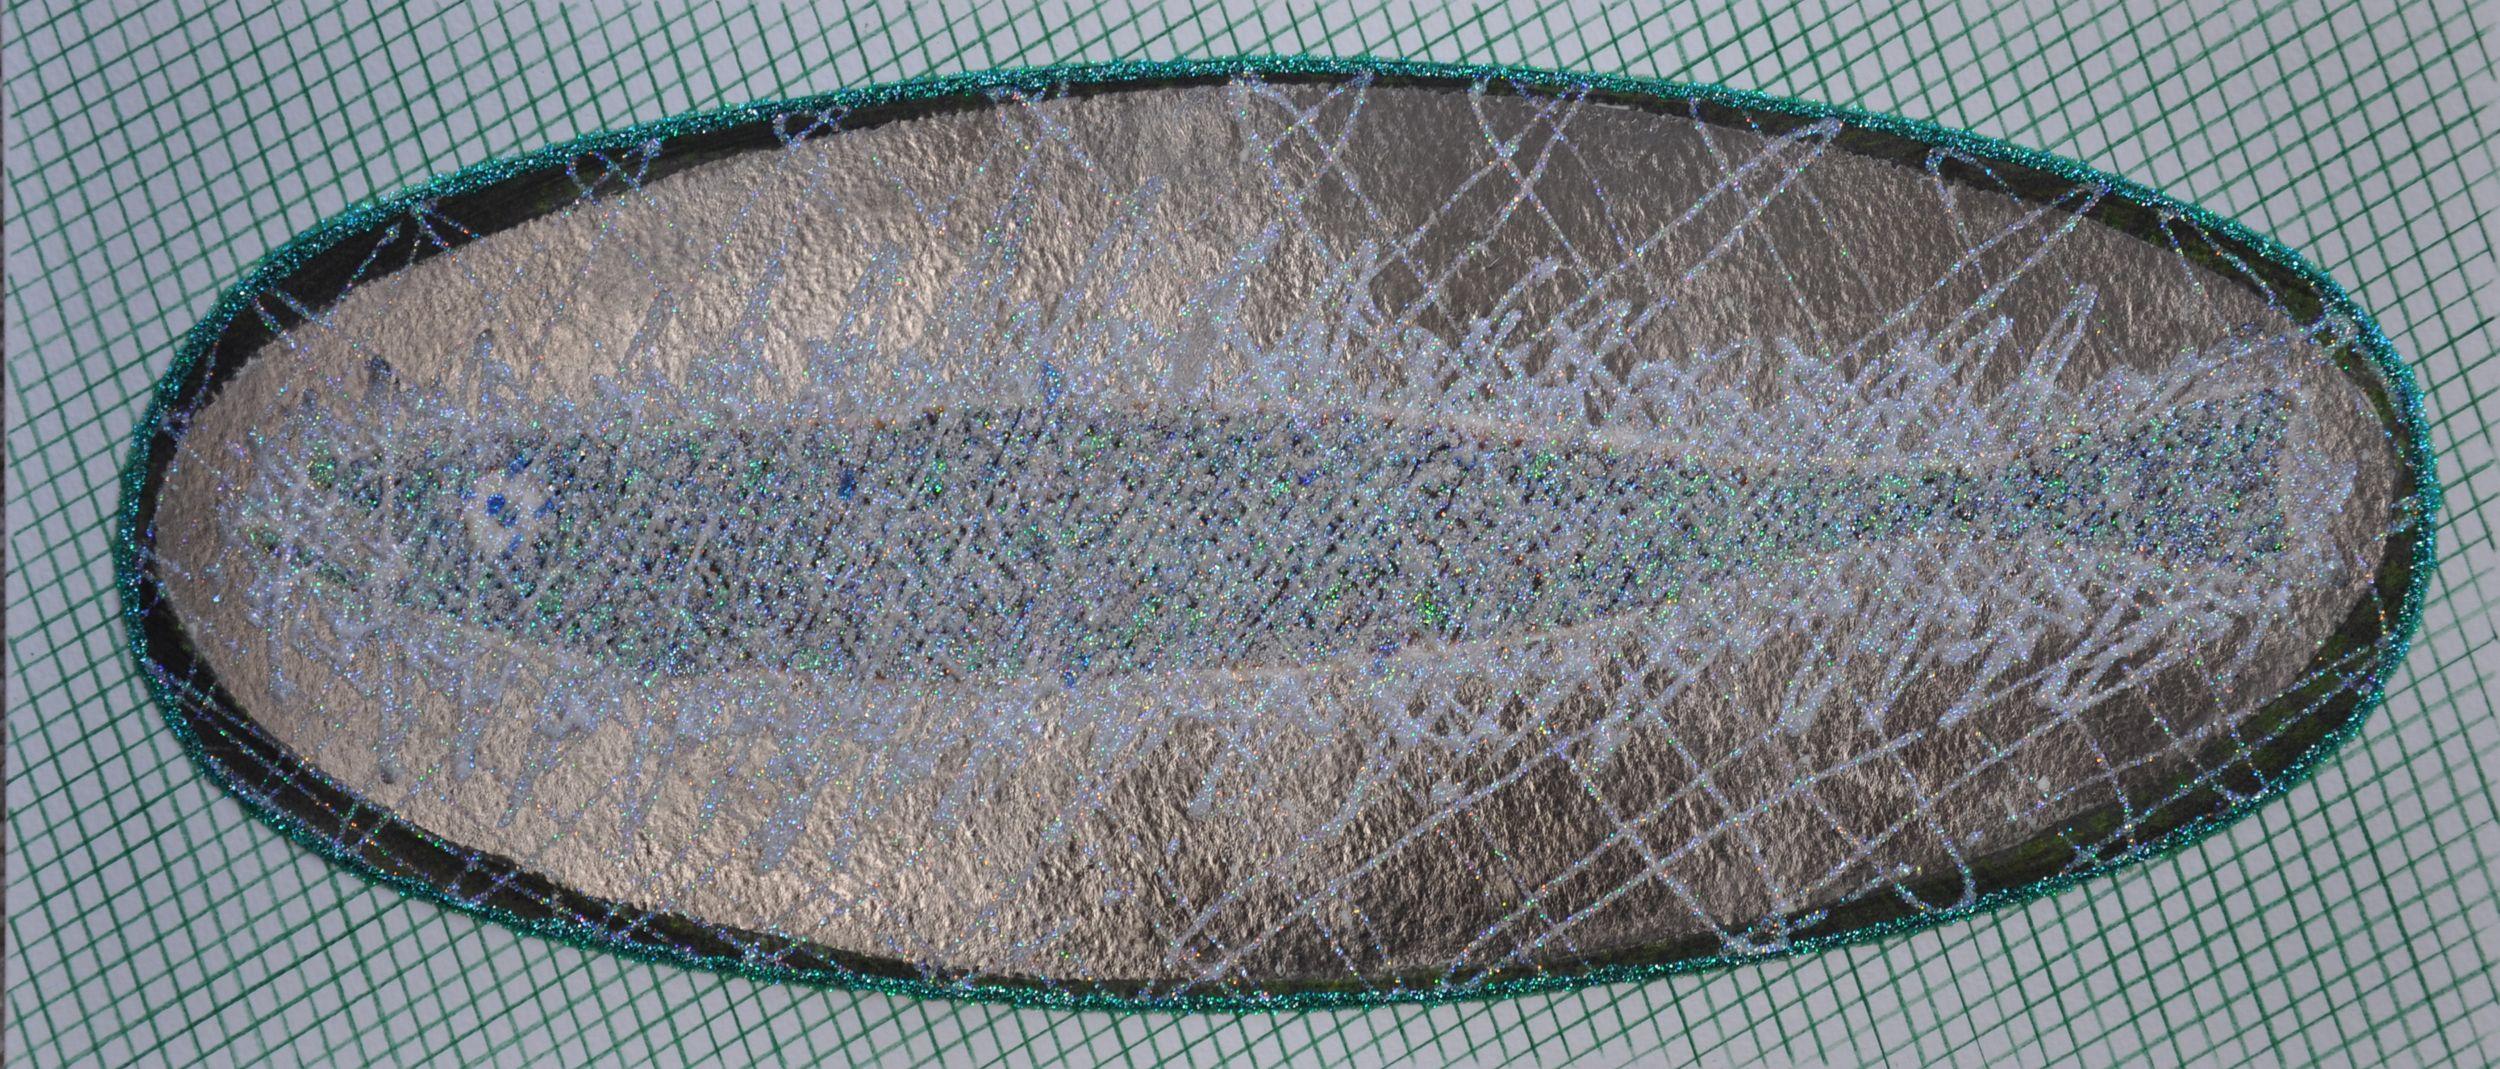 Salted Fish.jpg